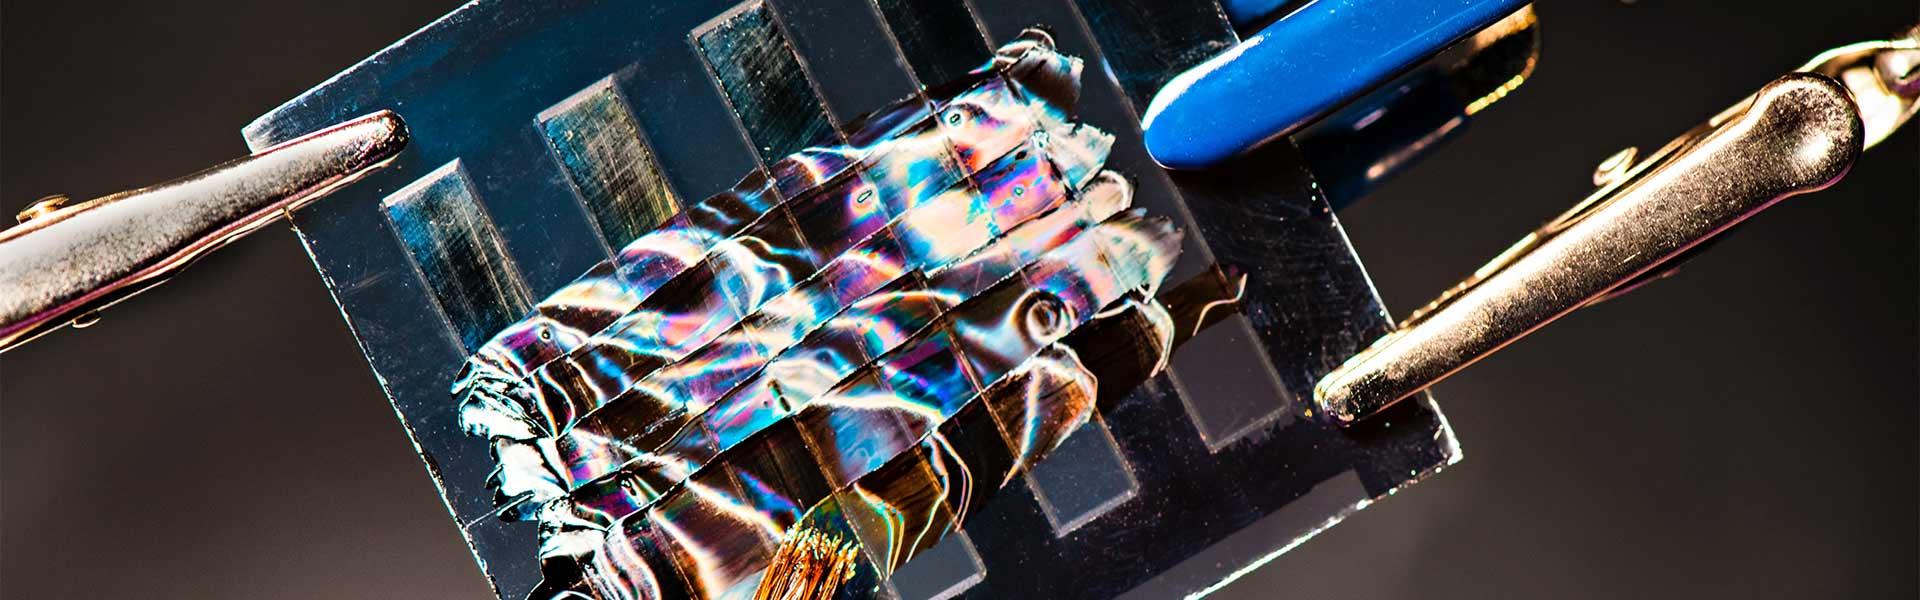 Macro shot of a solar panel